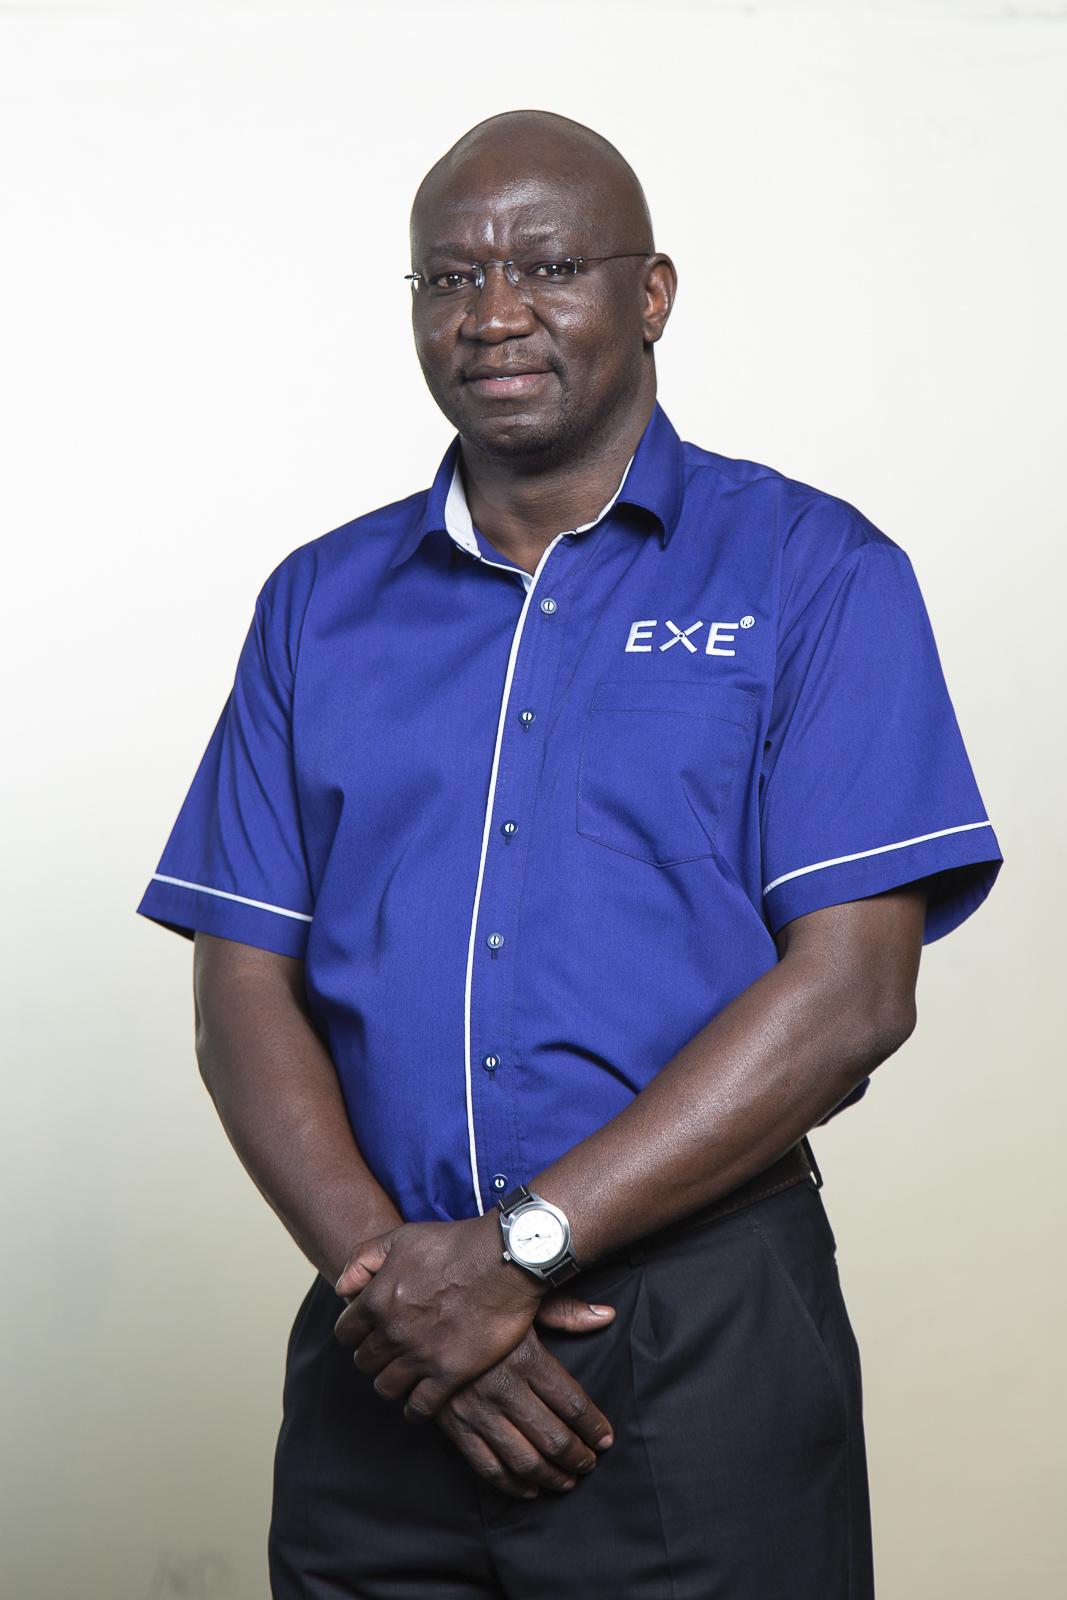 Andy Mwairumba